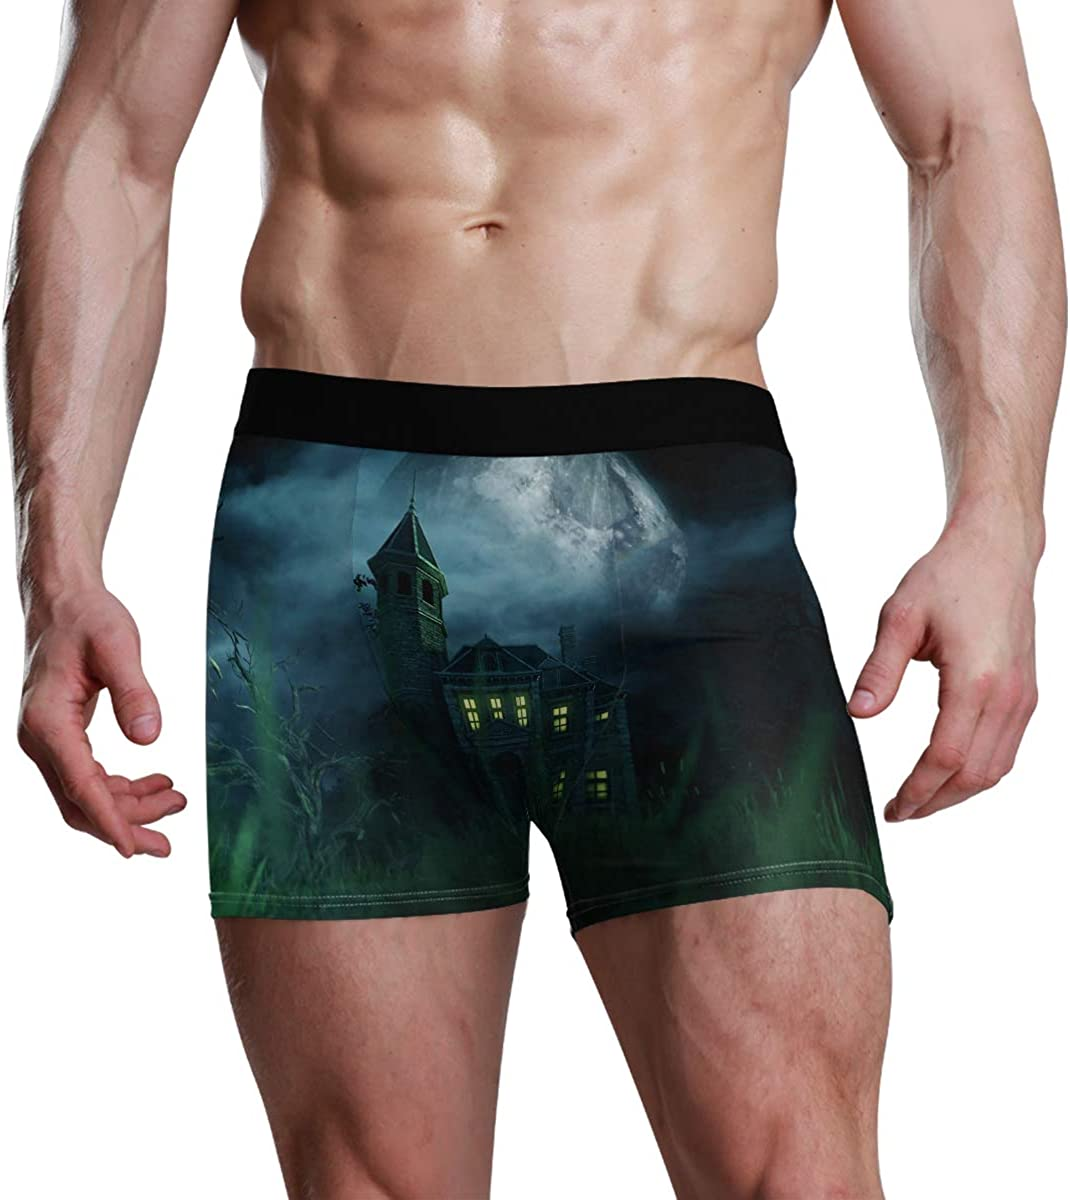 HangWang Mens Underwear Briefs Haunted House 3D Illustration Breathable Long Boxer Briefs Underwear Boys